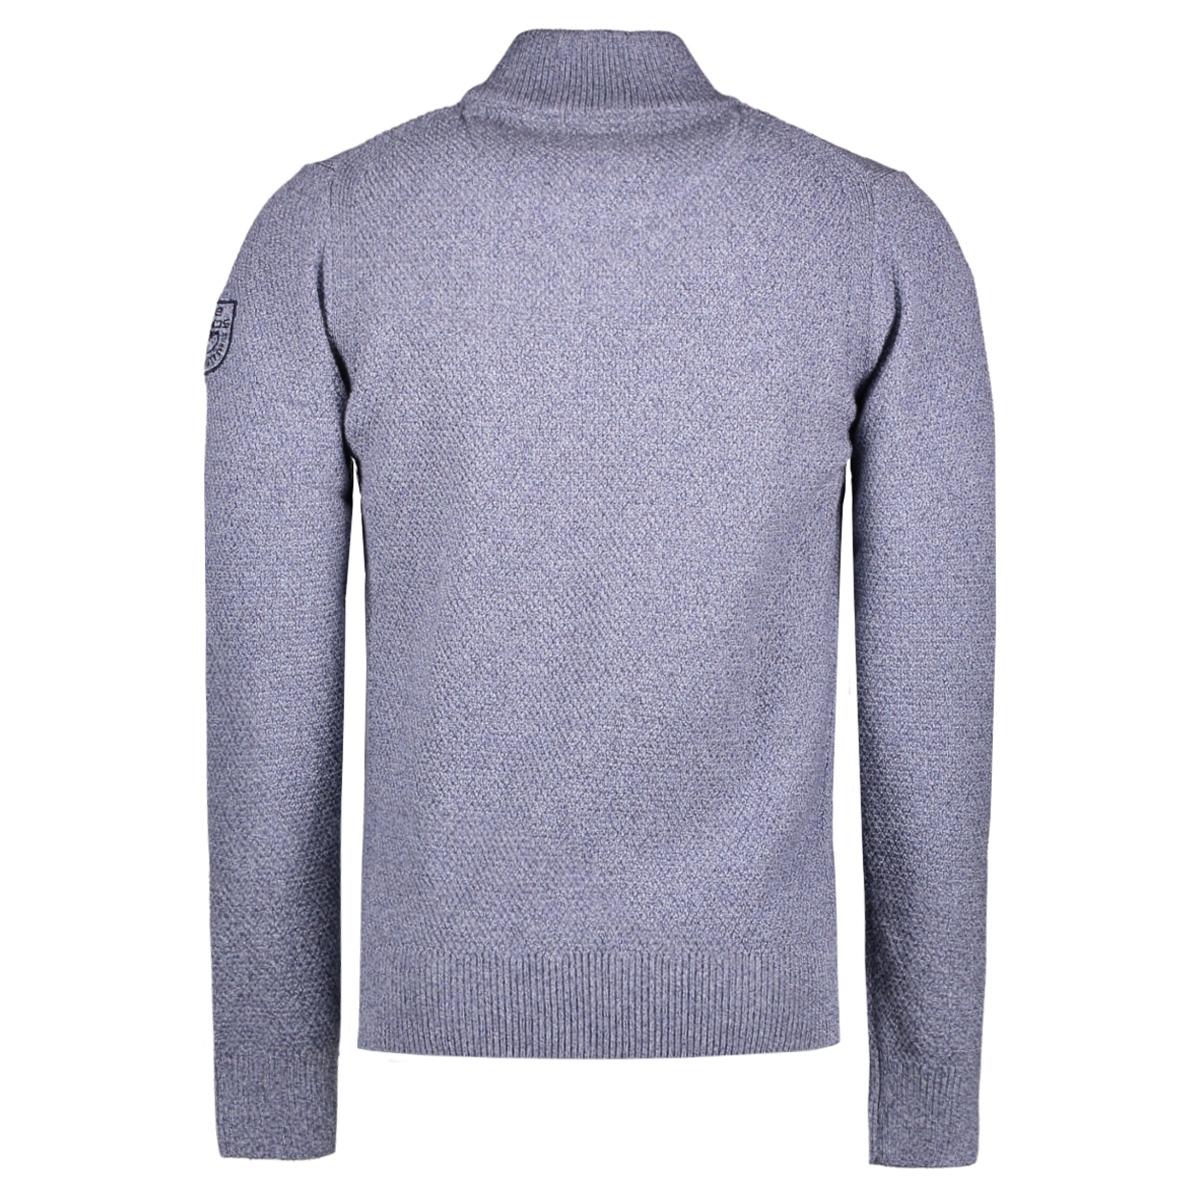 161-37018 bluefields vest 5965